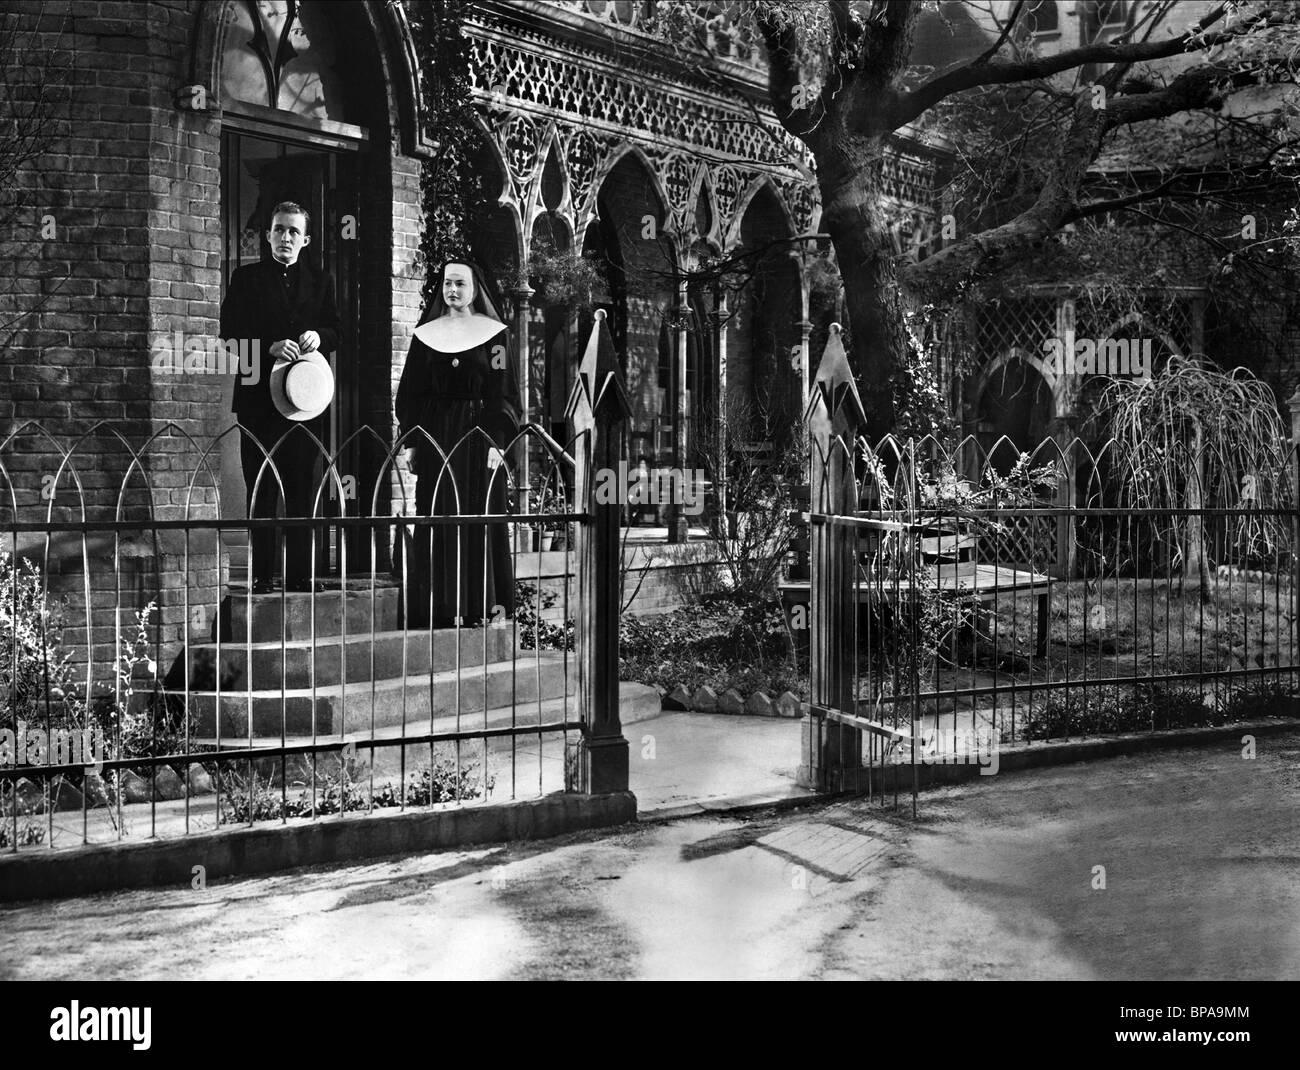 BING CROSBY INGRID BERGMAN THE BELLS OF ST. MARY'S (1945) - Stock Image